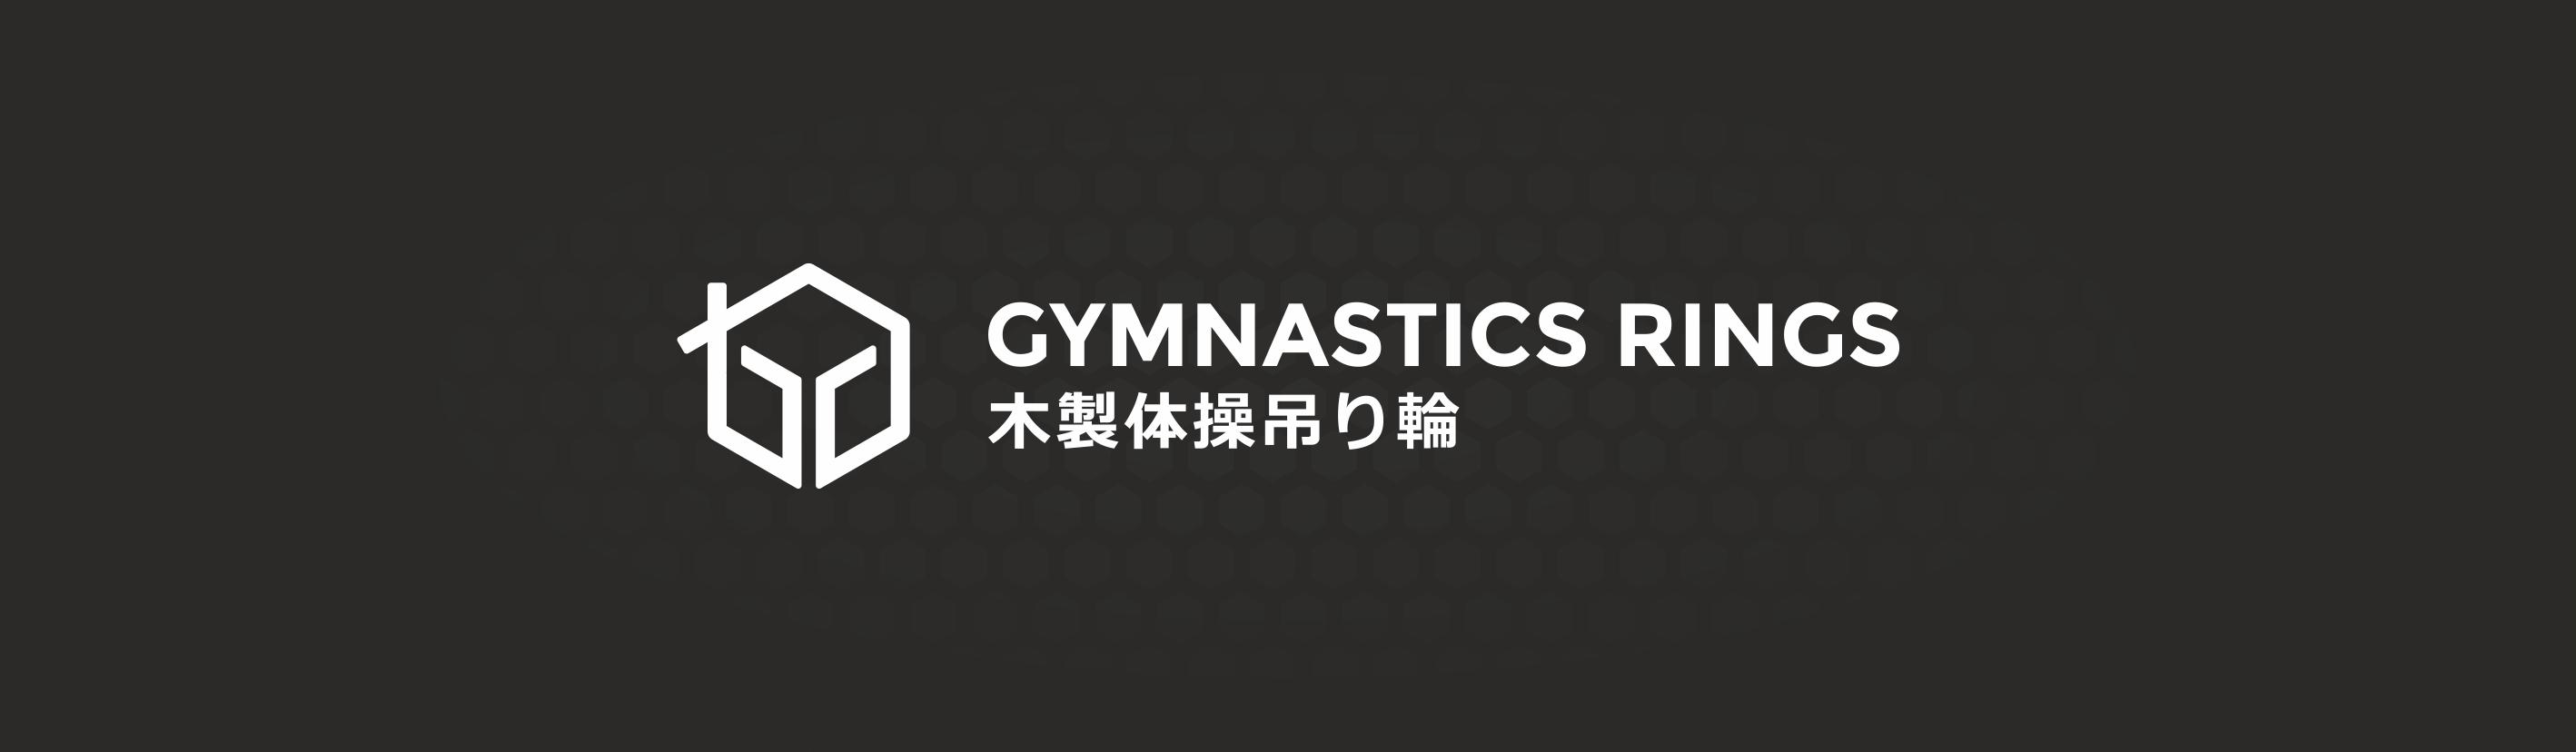 youngninja GYMNASTIC RINGS box design